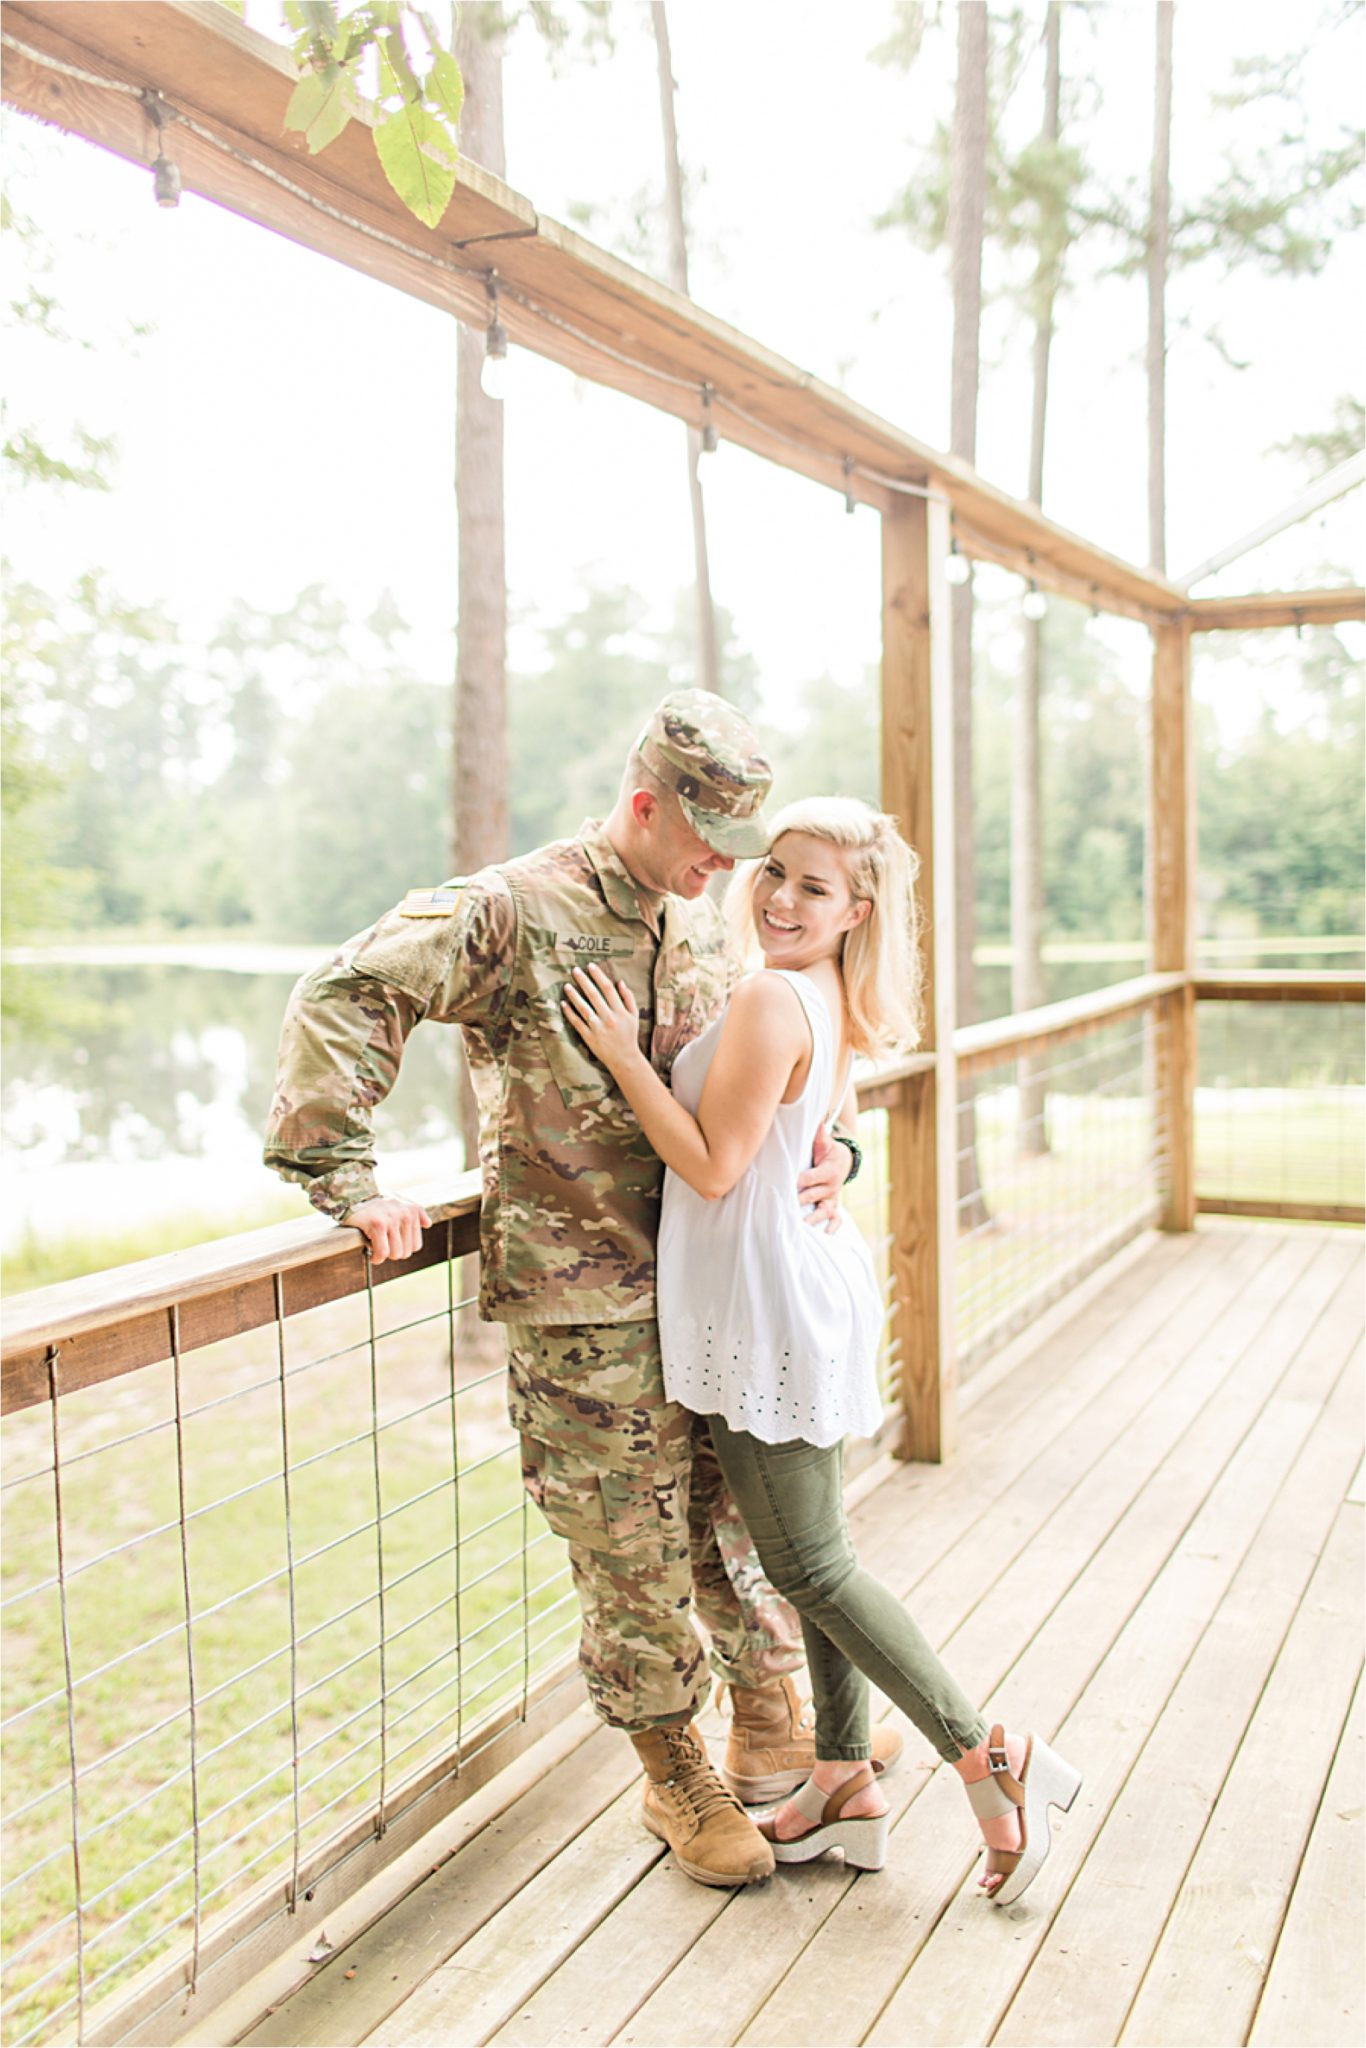 Laurel Mississippi, Brett & Sarah, Romantic Military Engagement, Mobile Alabama Photographer, Engagement Shoot Inspiration